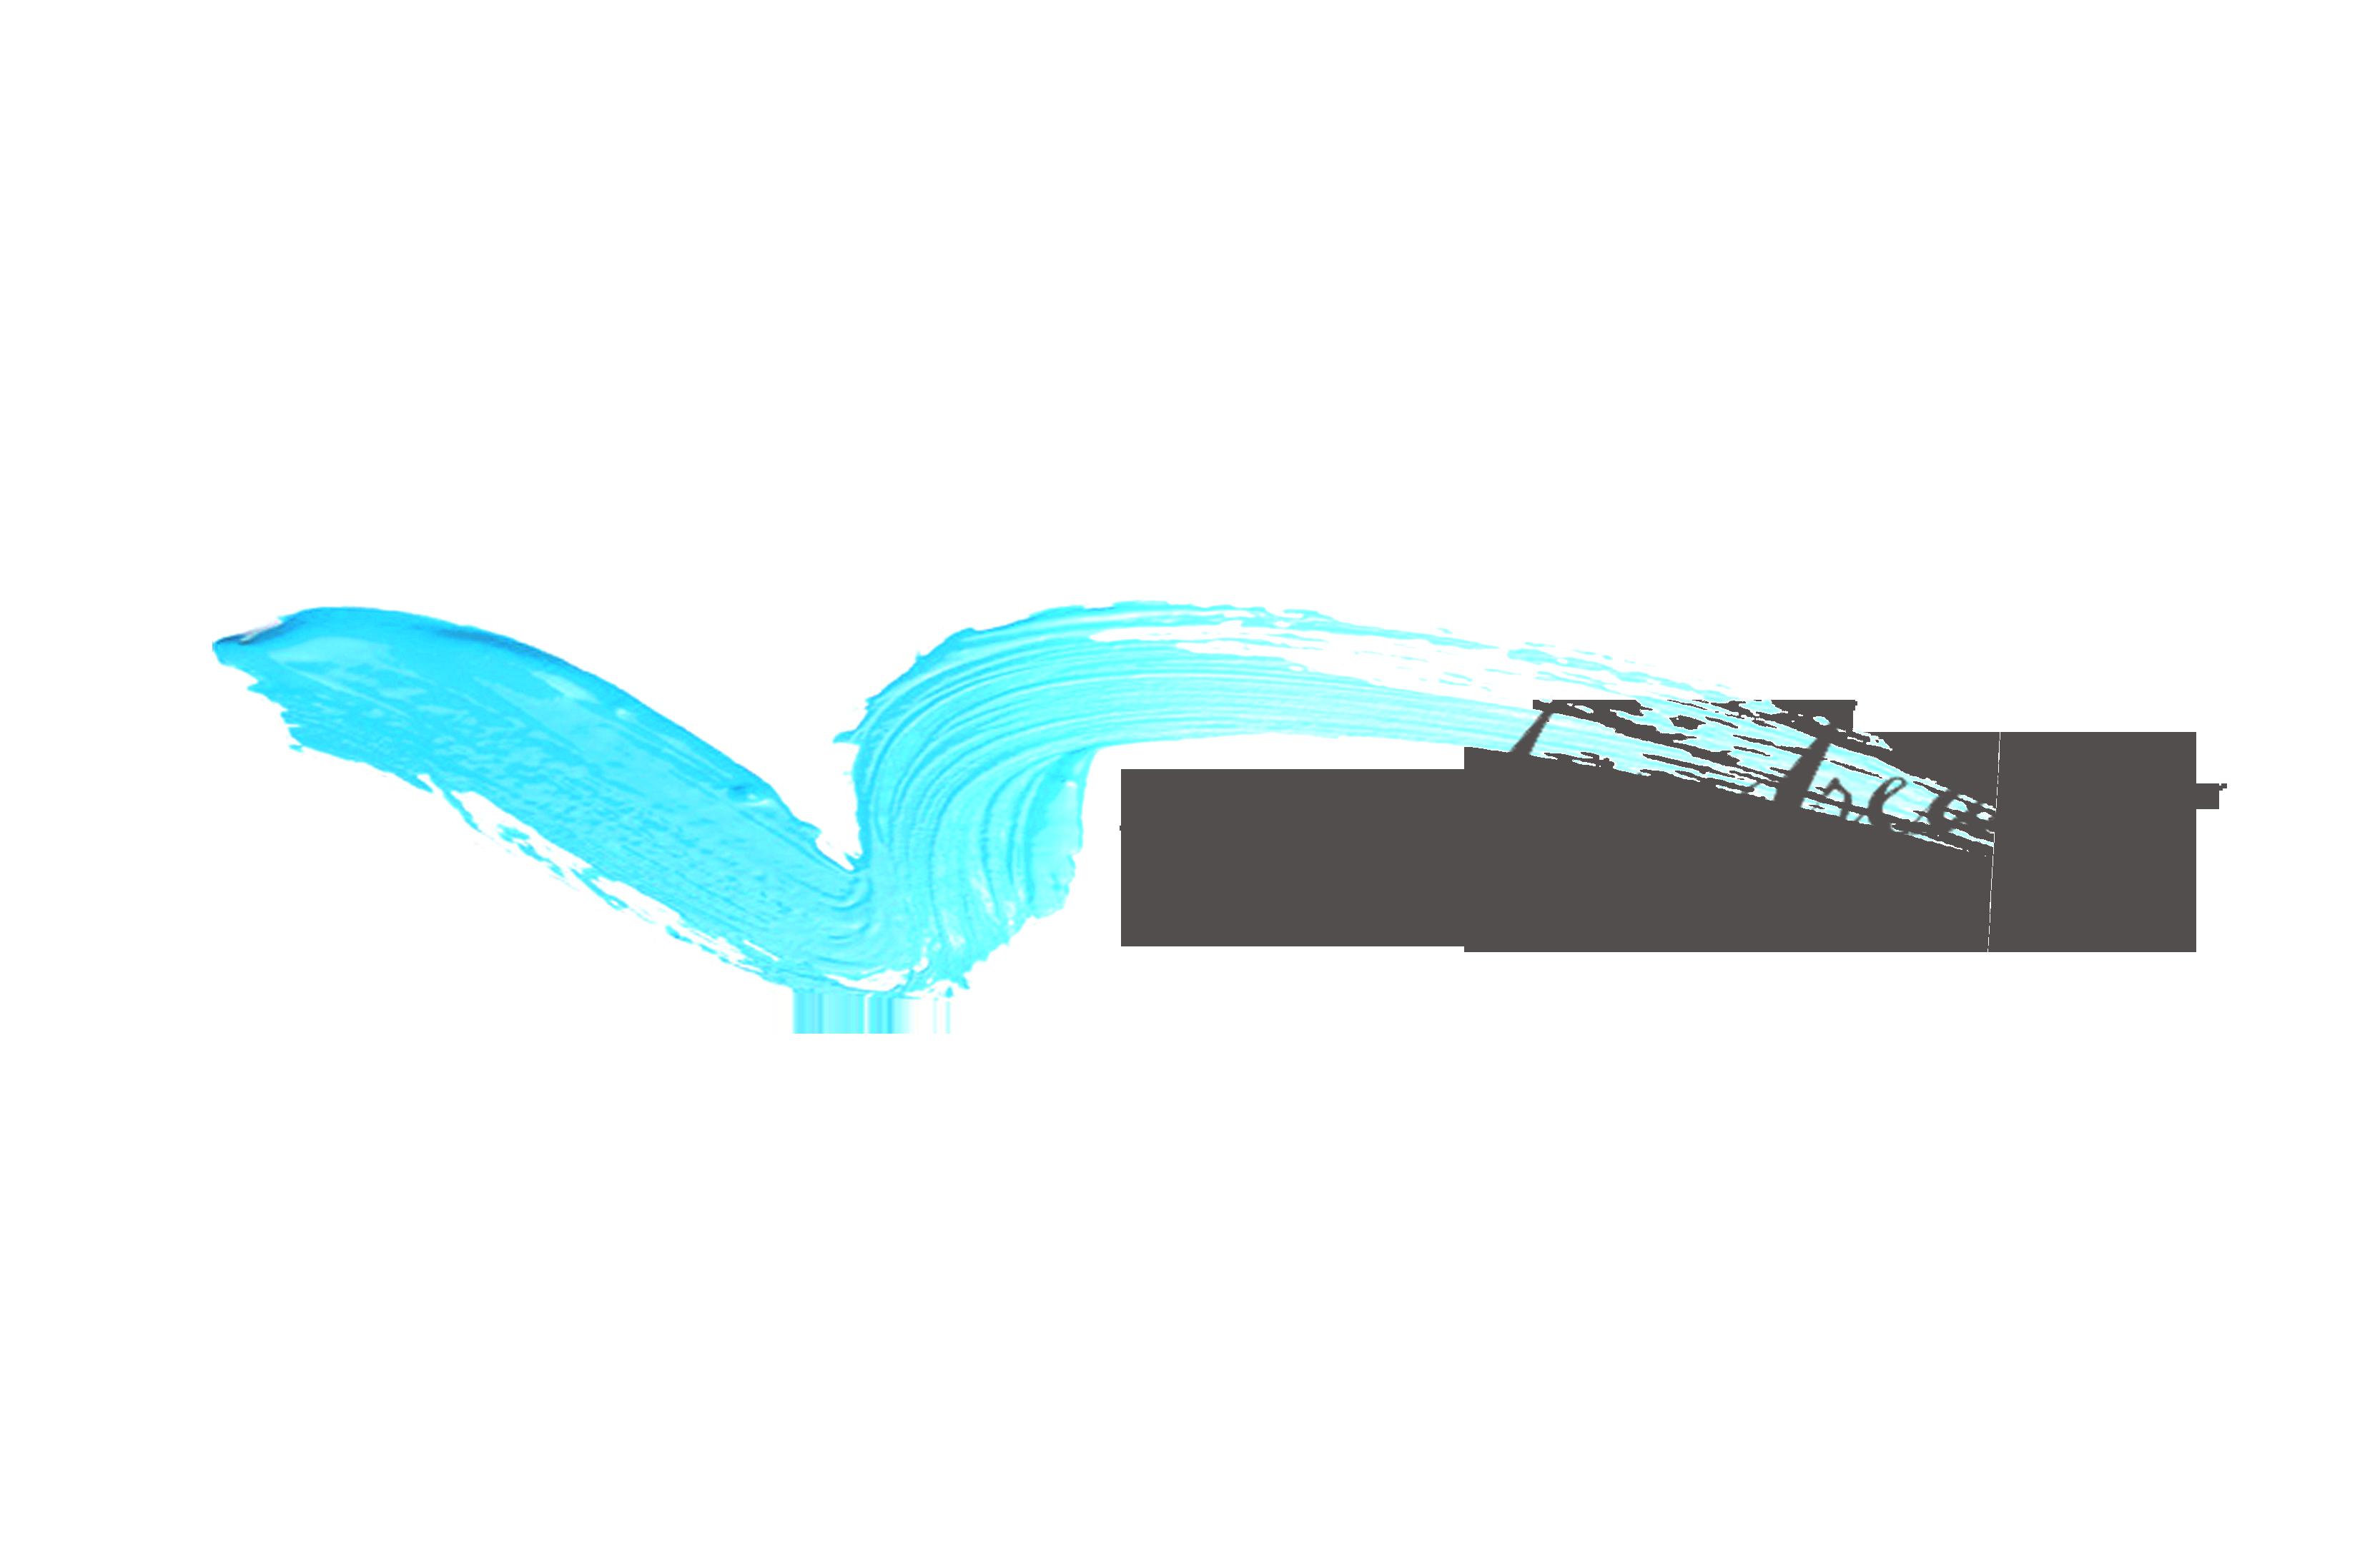 Uponaday Dreamer's Signature